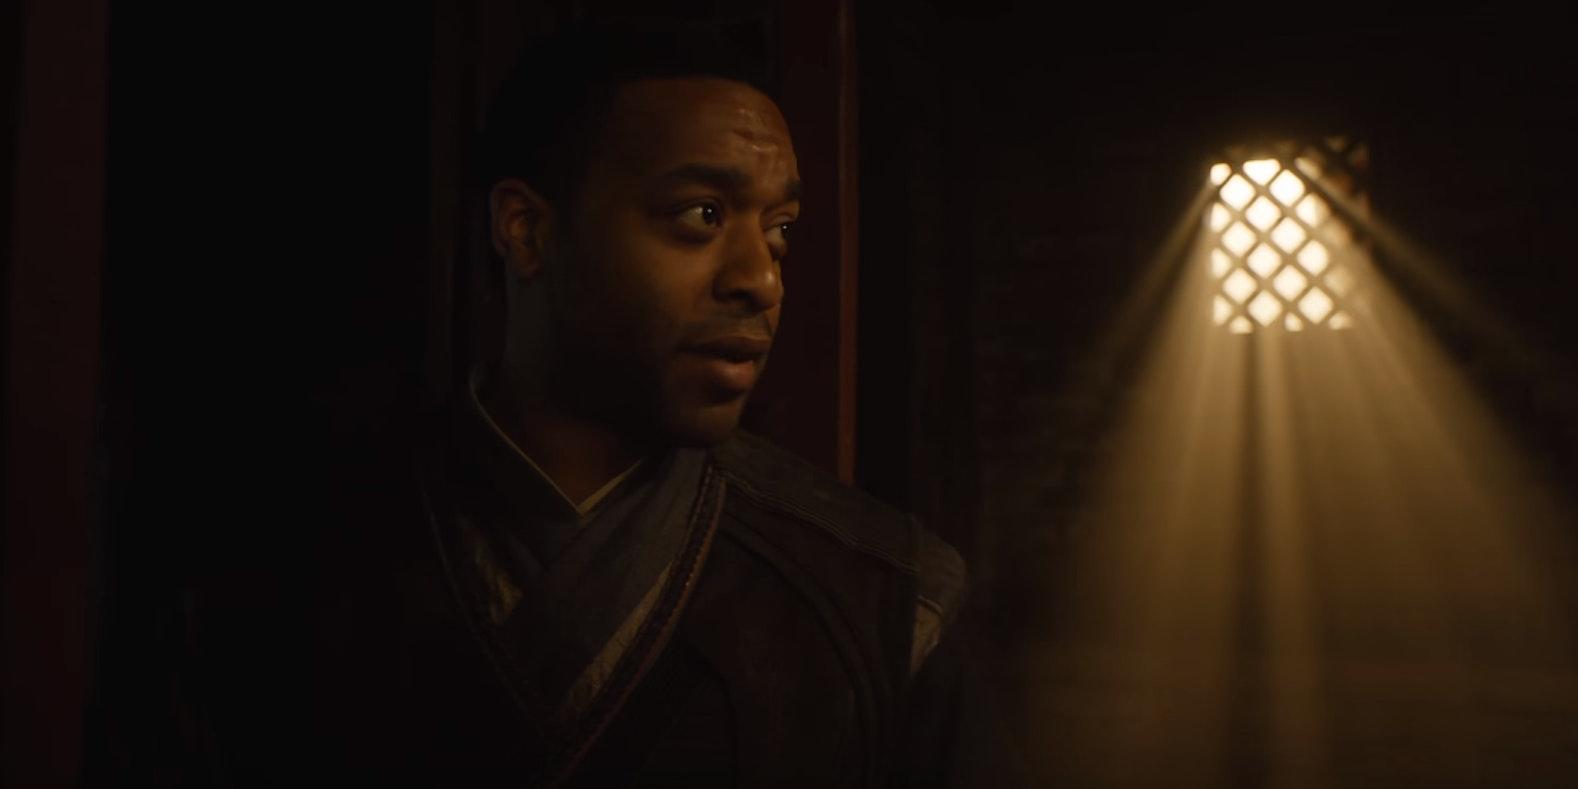 Chiwetel Ejiofor as Mordo in Marvel's Doctor Strange